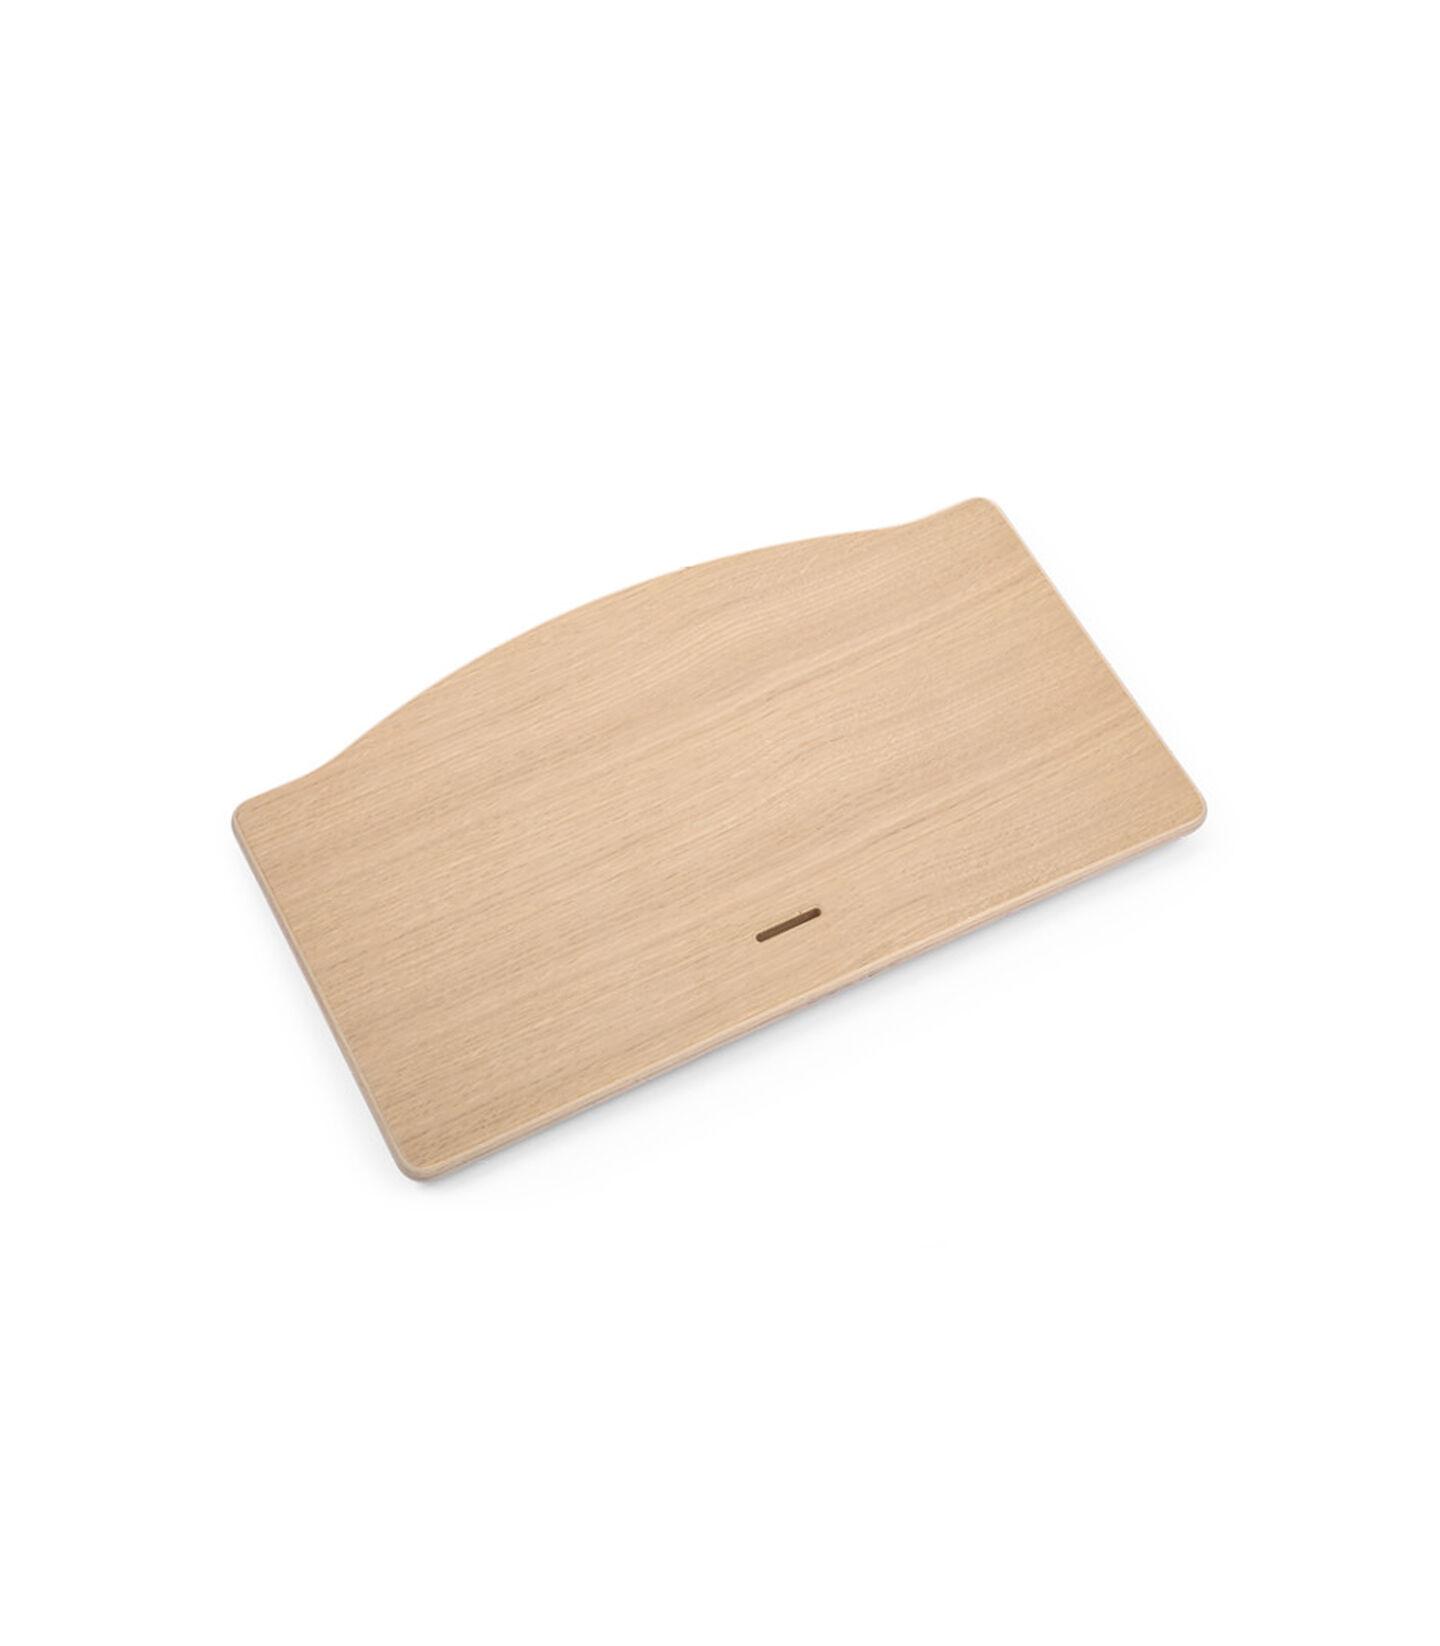 Tripp Trapp® Seatplate Oak White, Roble Natural, mainview view 2